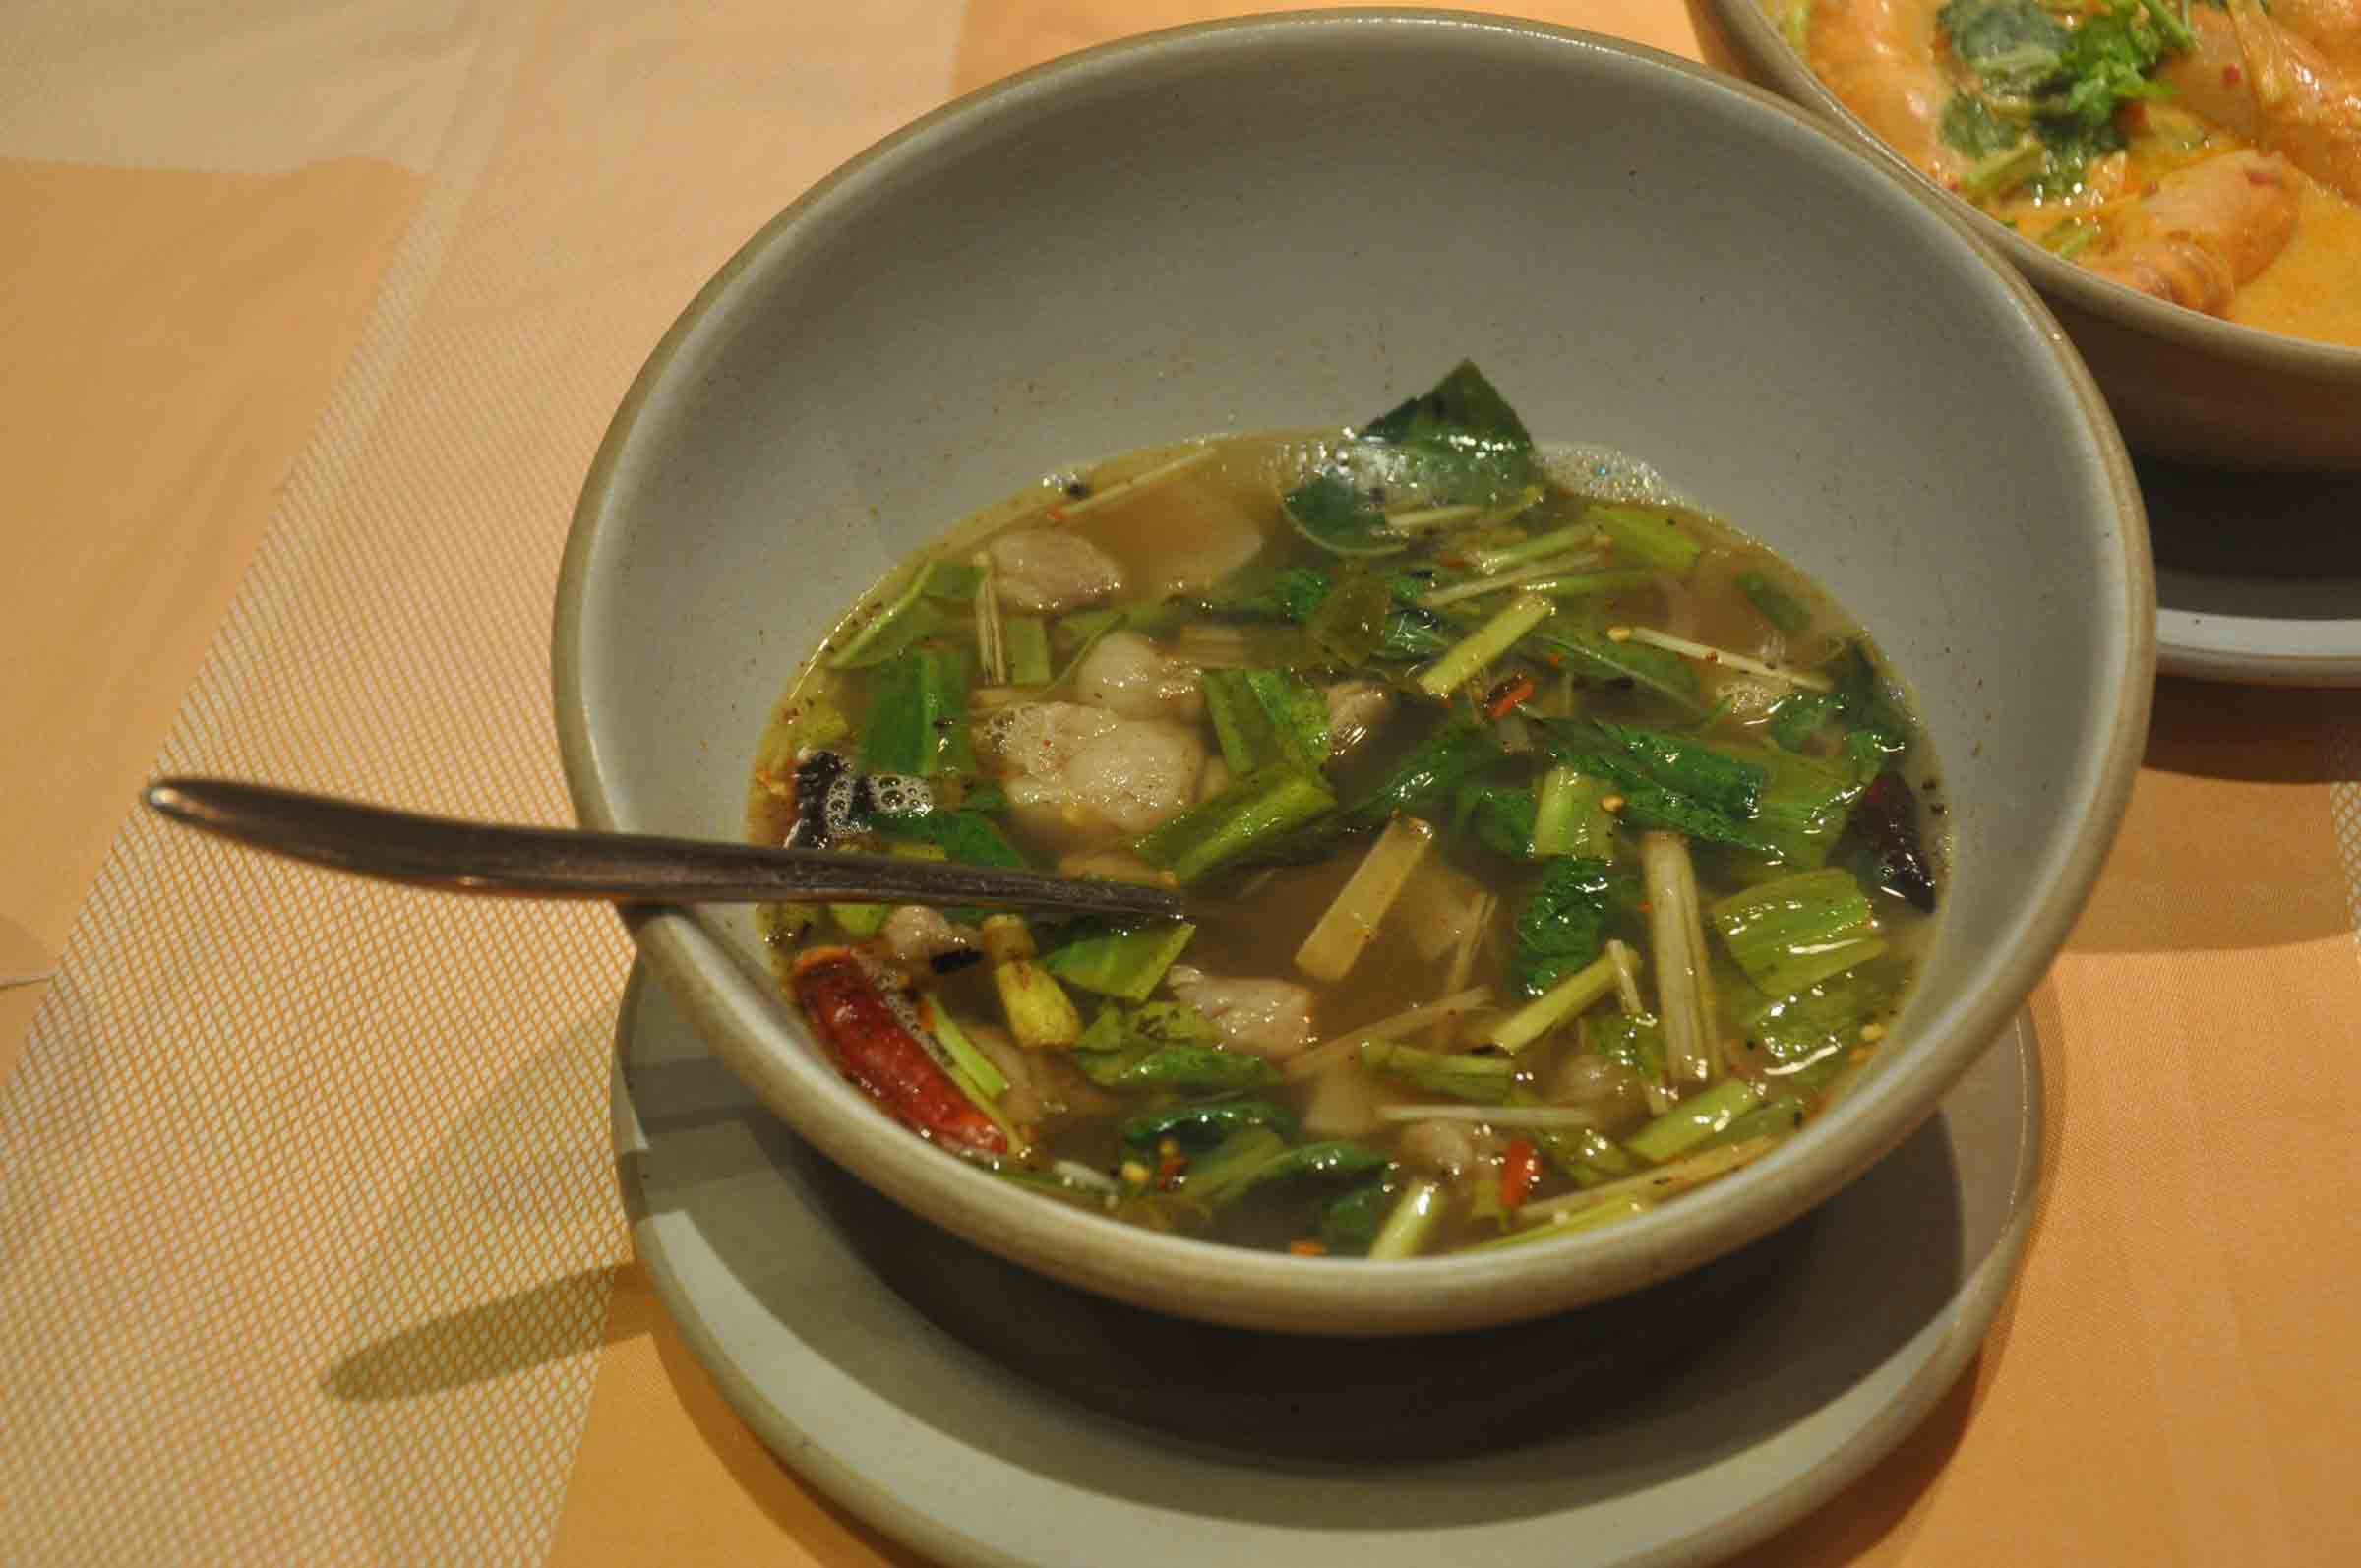 Saffron Macau Tom Yang soup